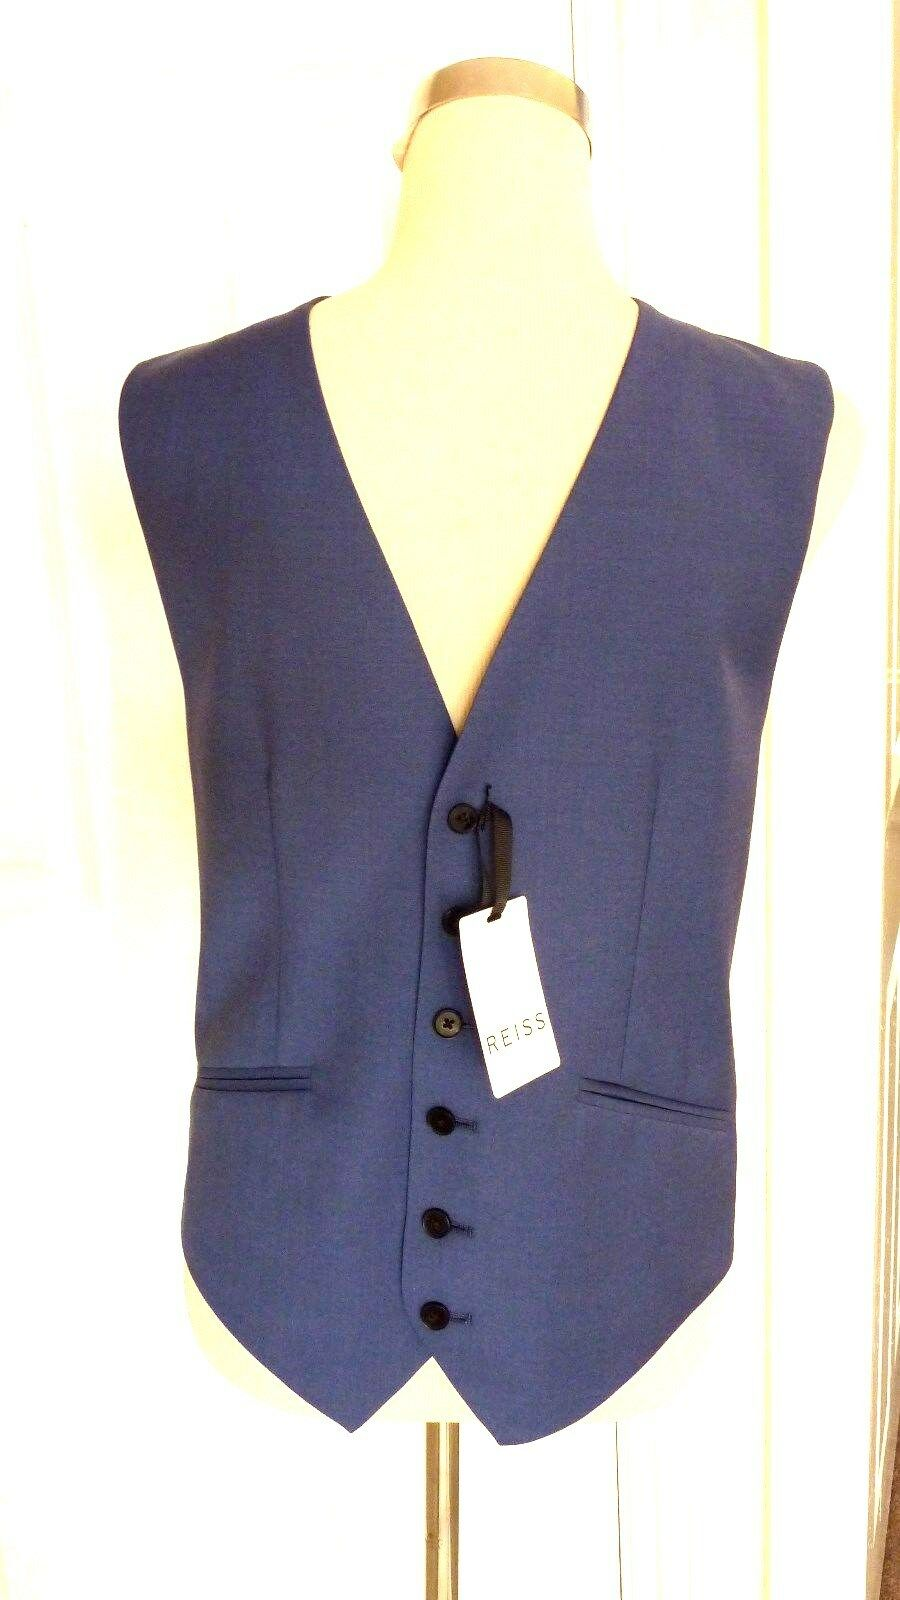 BNWT REISS Men's bluee Garth Tailored Classic Waistcoat. Size 36  rrp